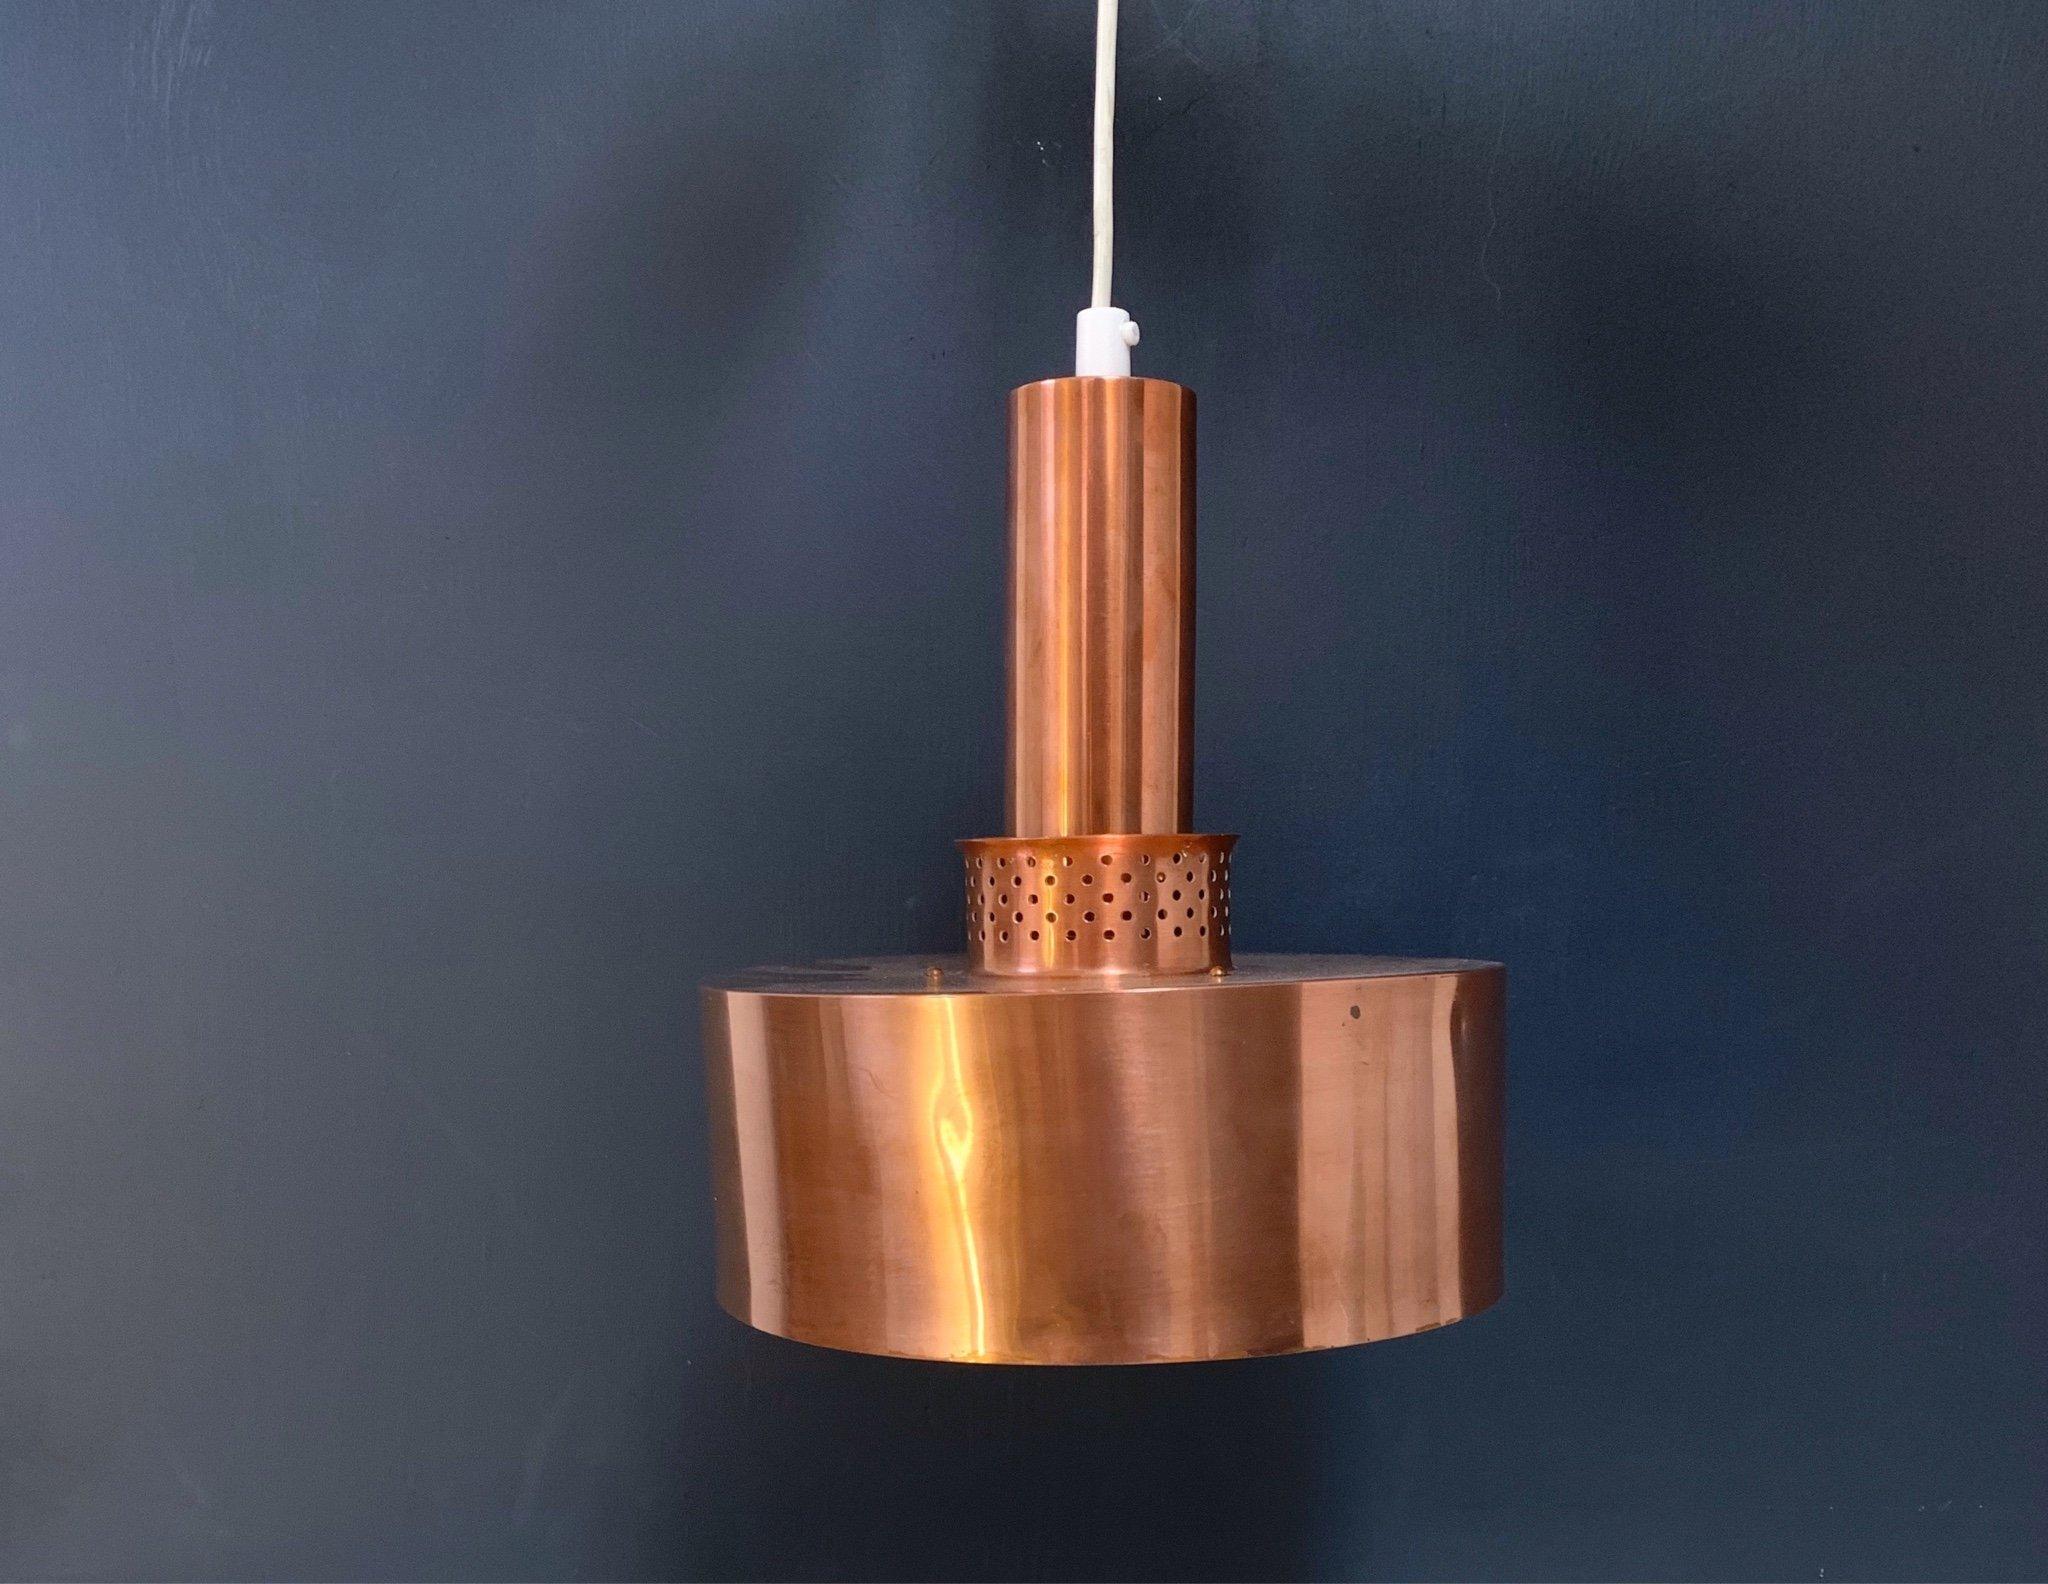 Hans Agne Jakobsson 1 st, taklampa Markaryd ( HAJ lampa koppar )